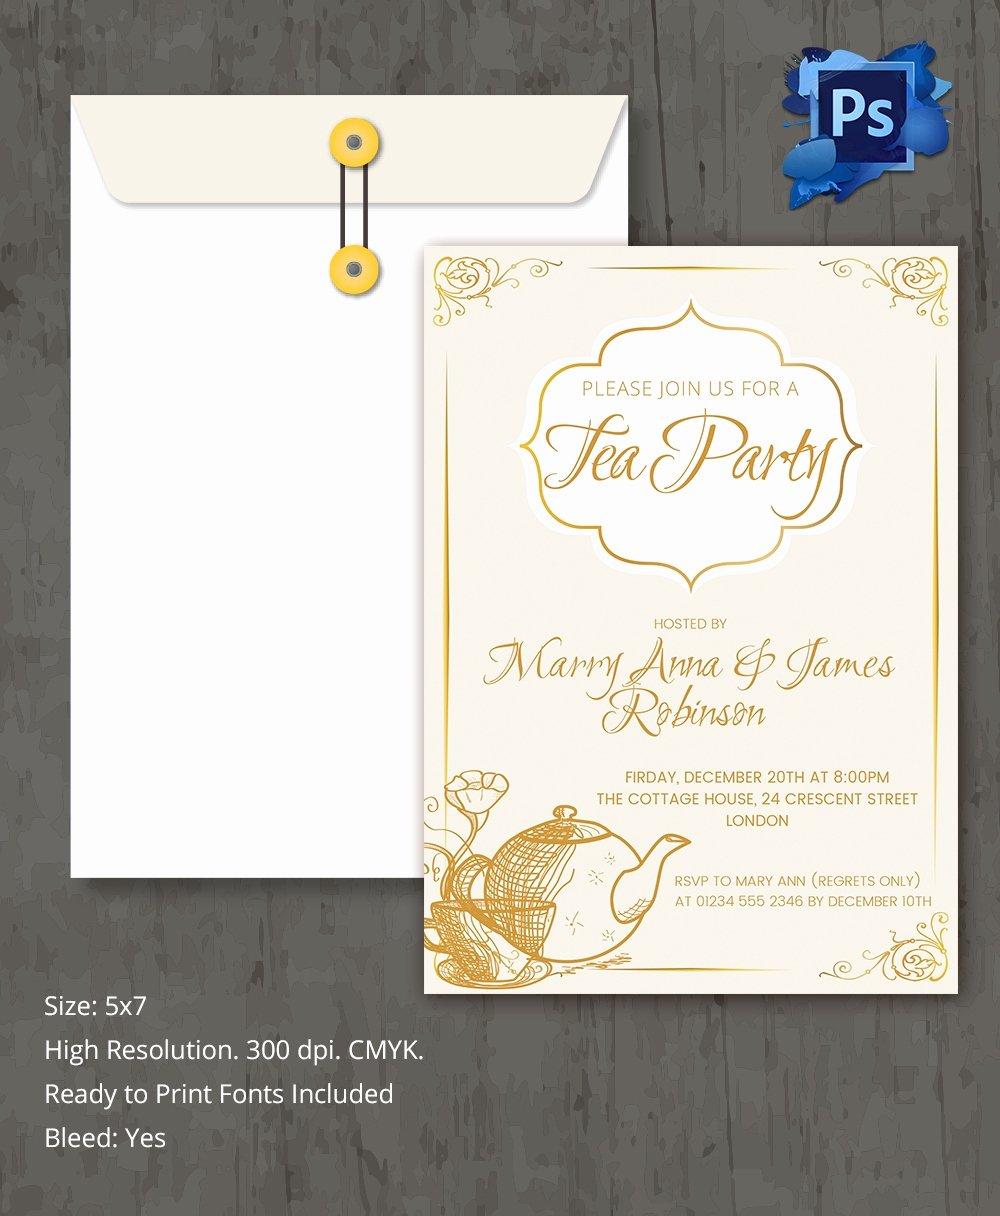 Tea Party Invite Template Best Of 22 Tea Party Invitation Templates